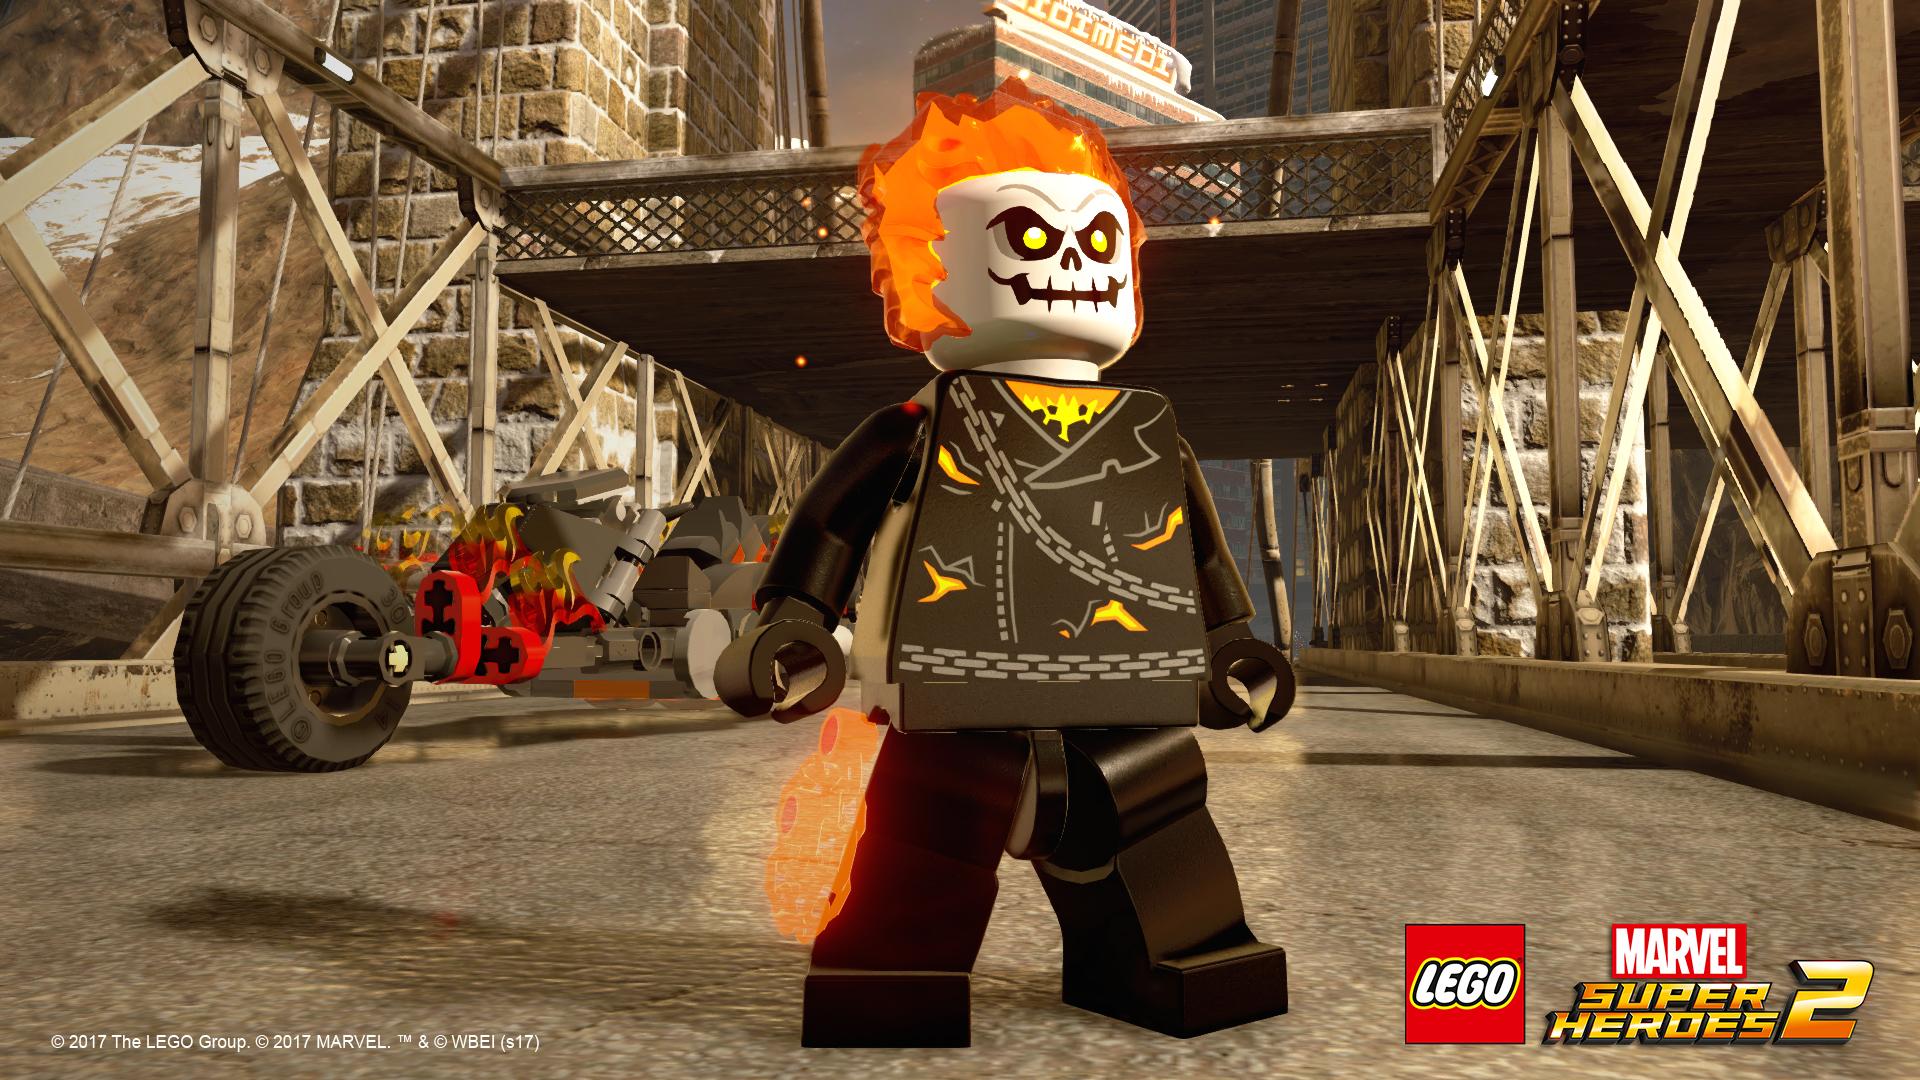 LEGO_Marvel_Super_Heroes_2_-_Ghost_Rider_1507794991